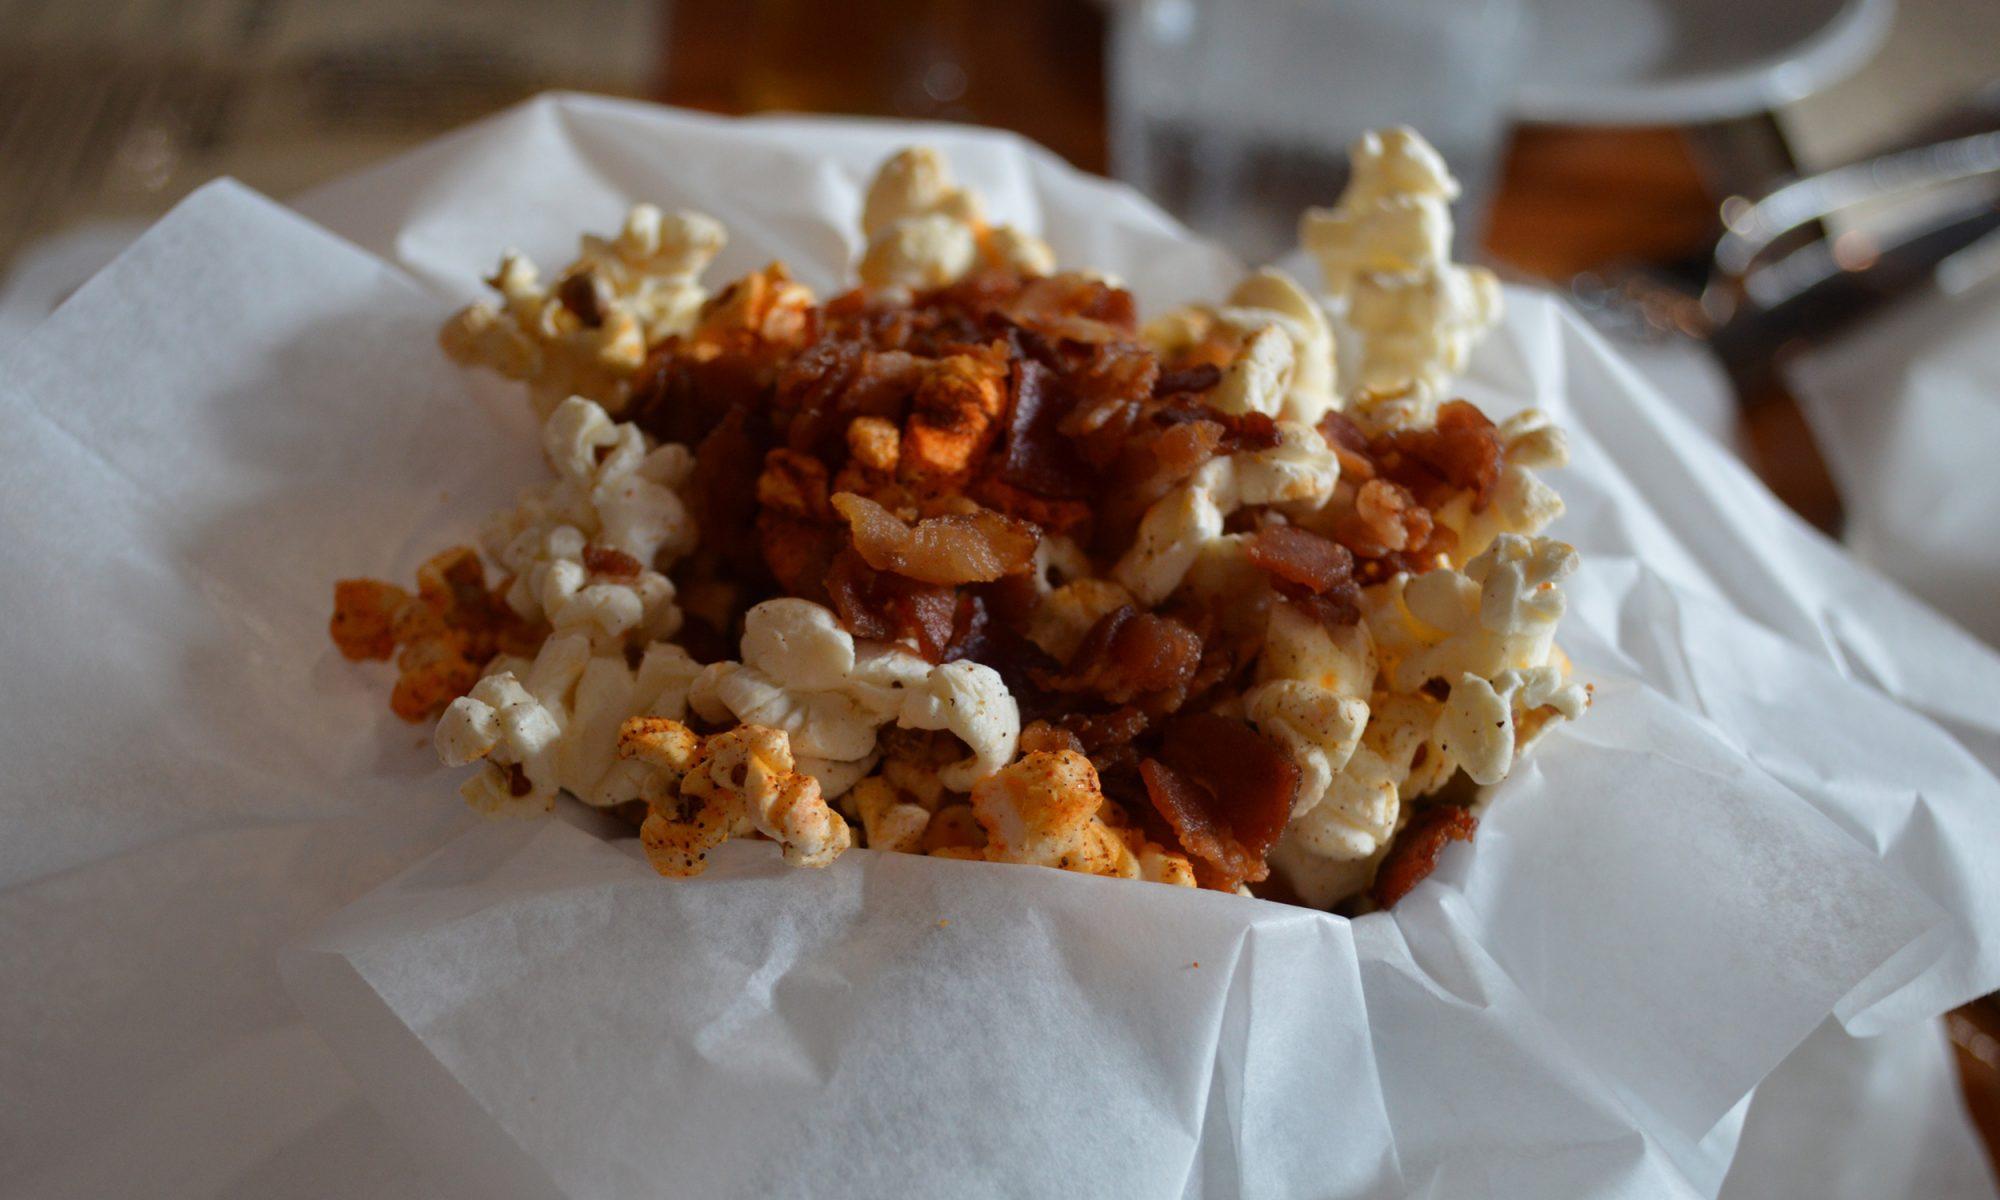 EC:  assets%2Fmessage-editor%2F1463152877593-salty-bacon-popcorn-flickr